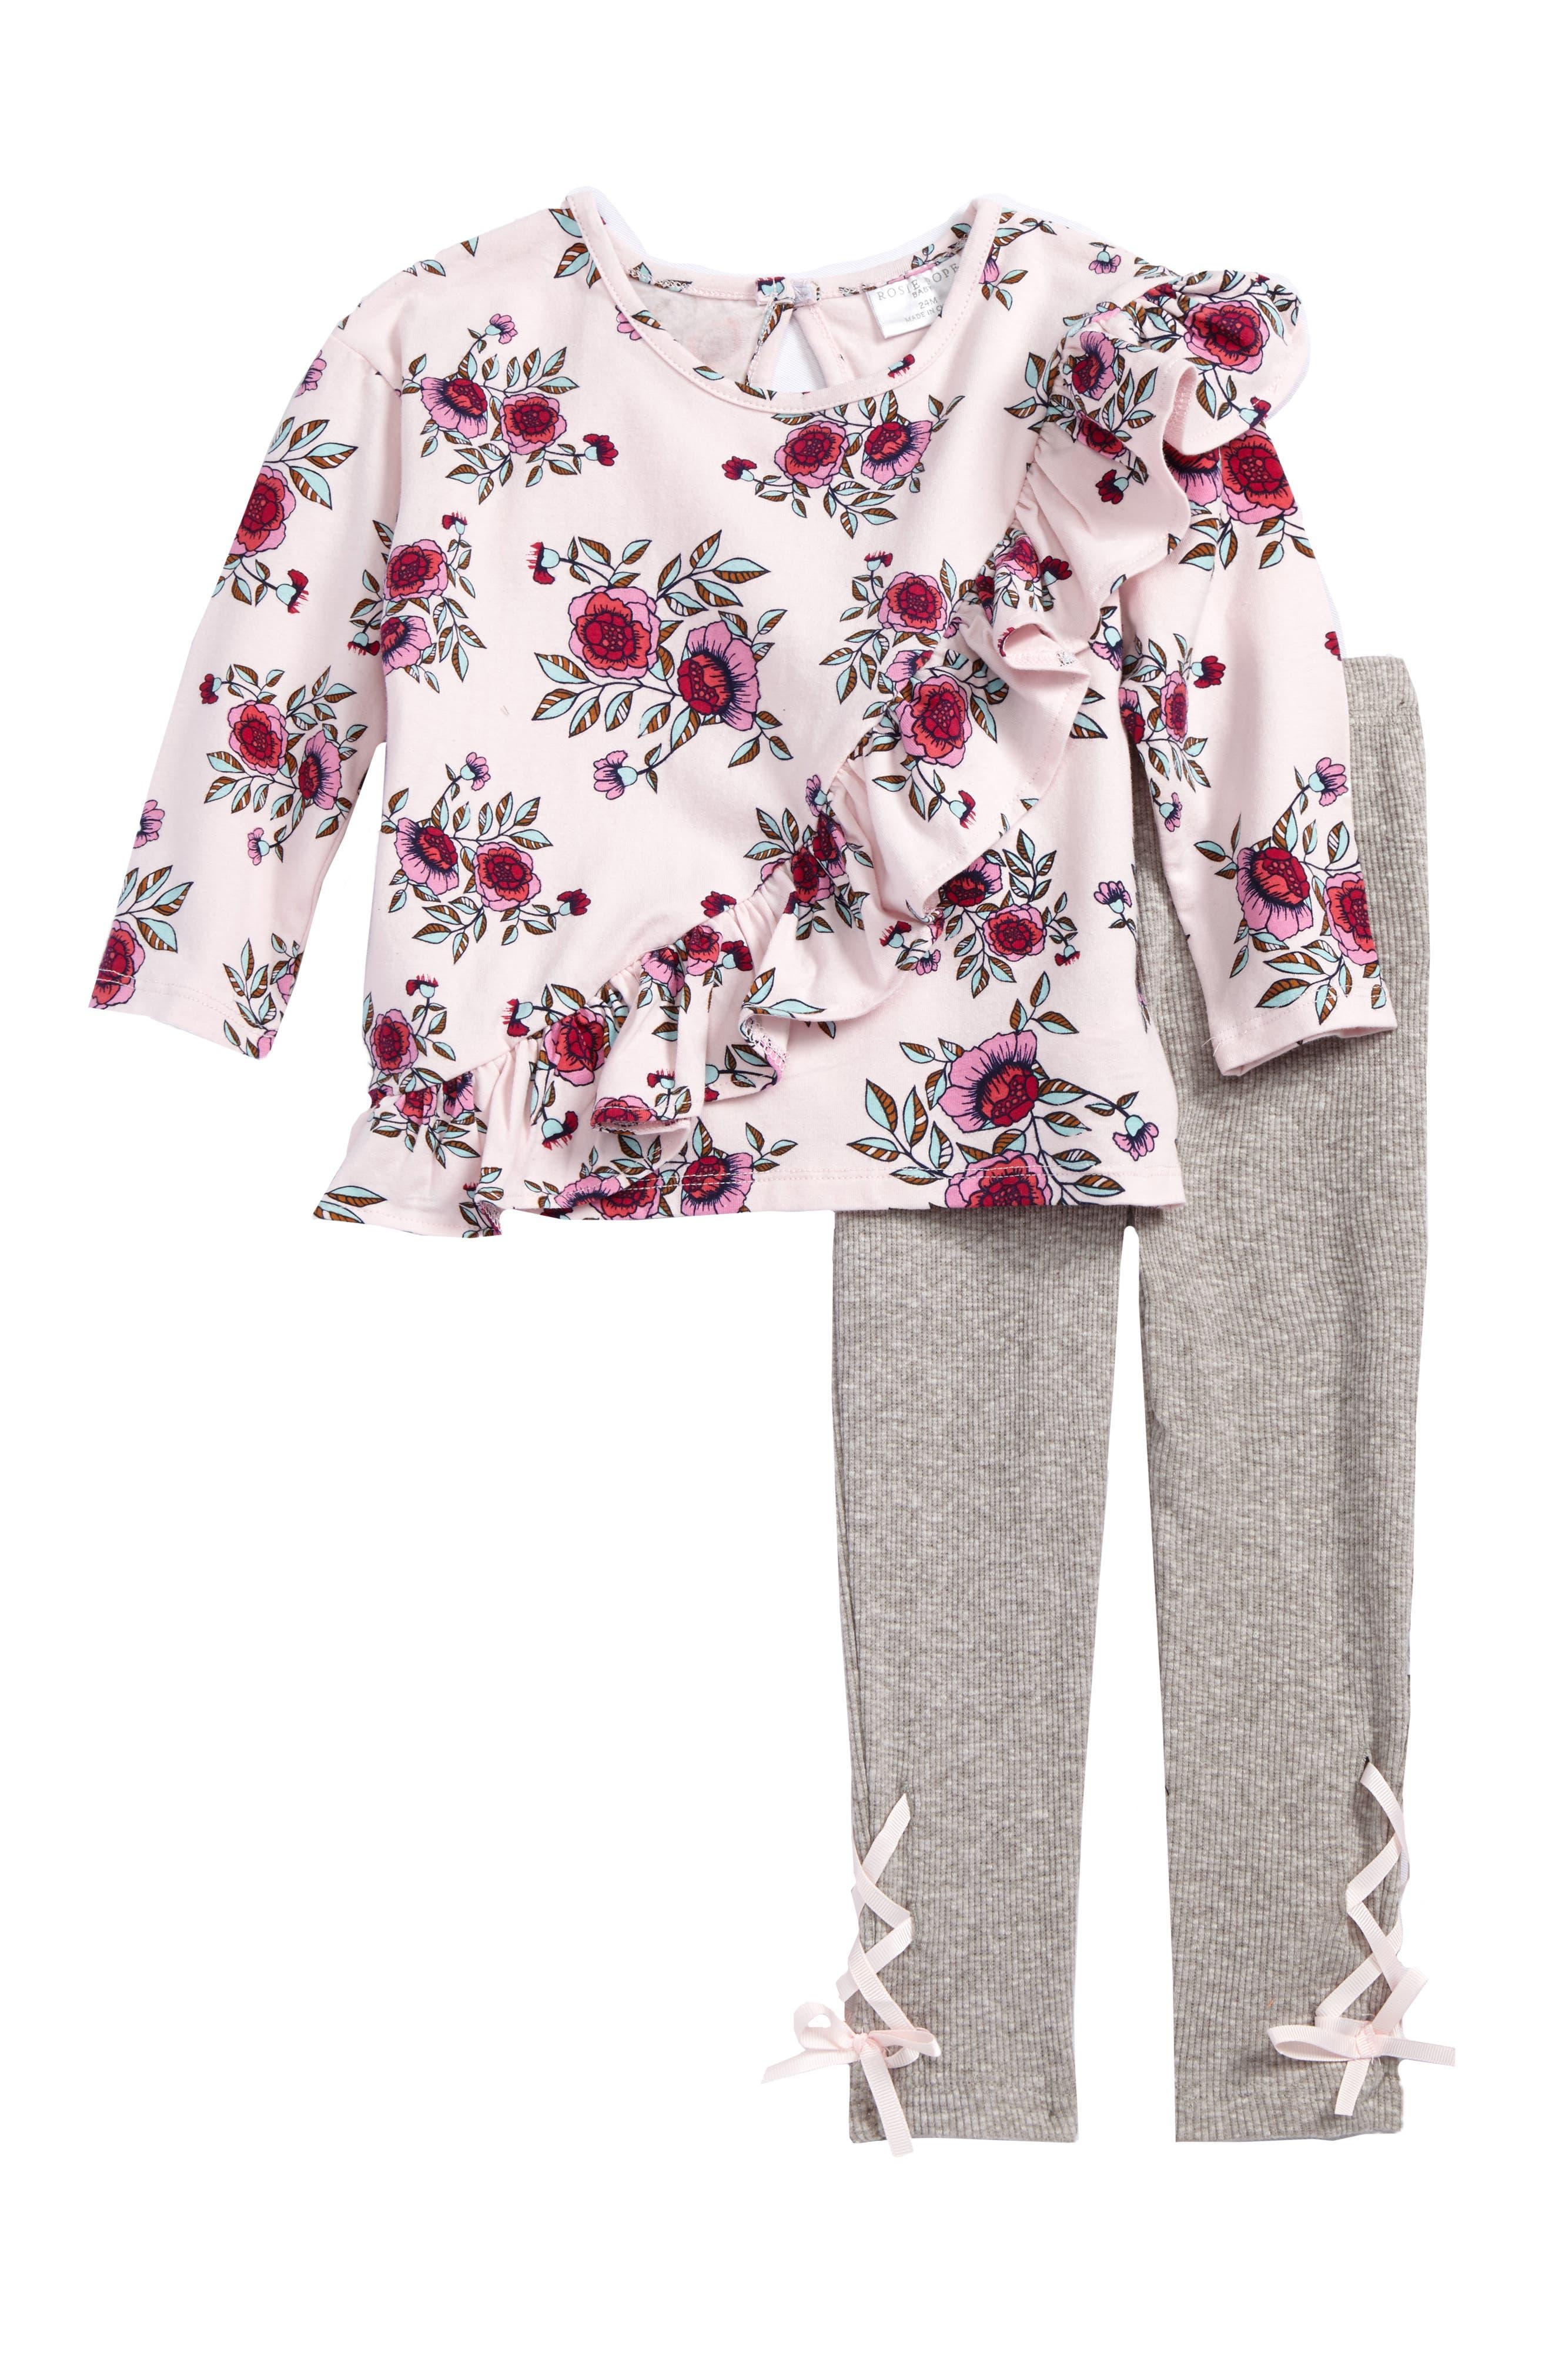 Rosie Pope Floral Print Ruffle Tee & Rib Knit Leggings Set (Baby Girls)